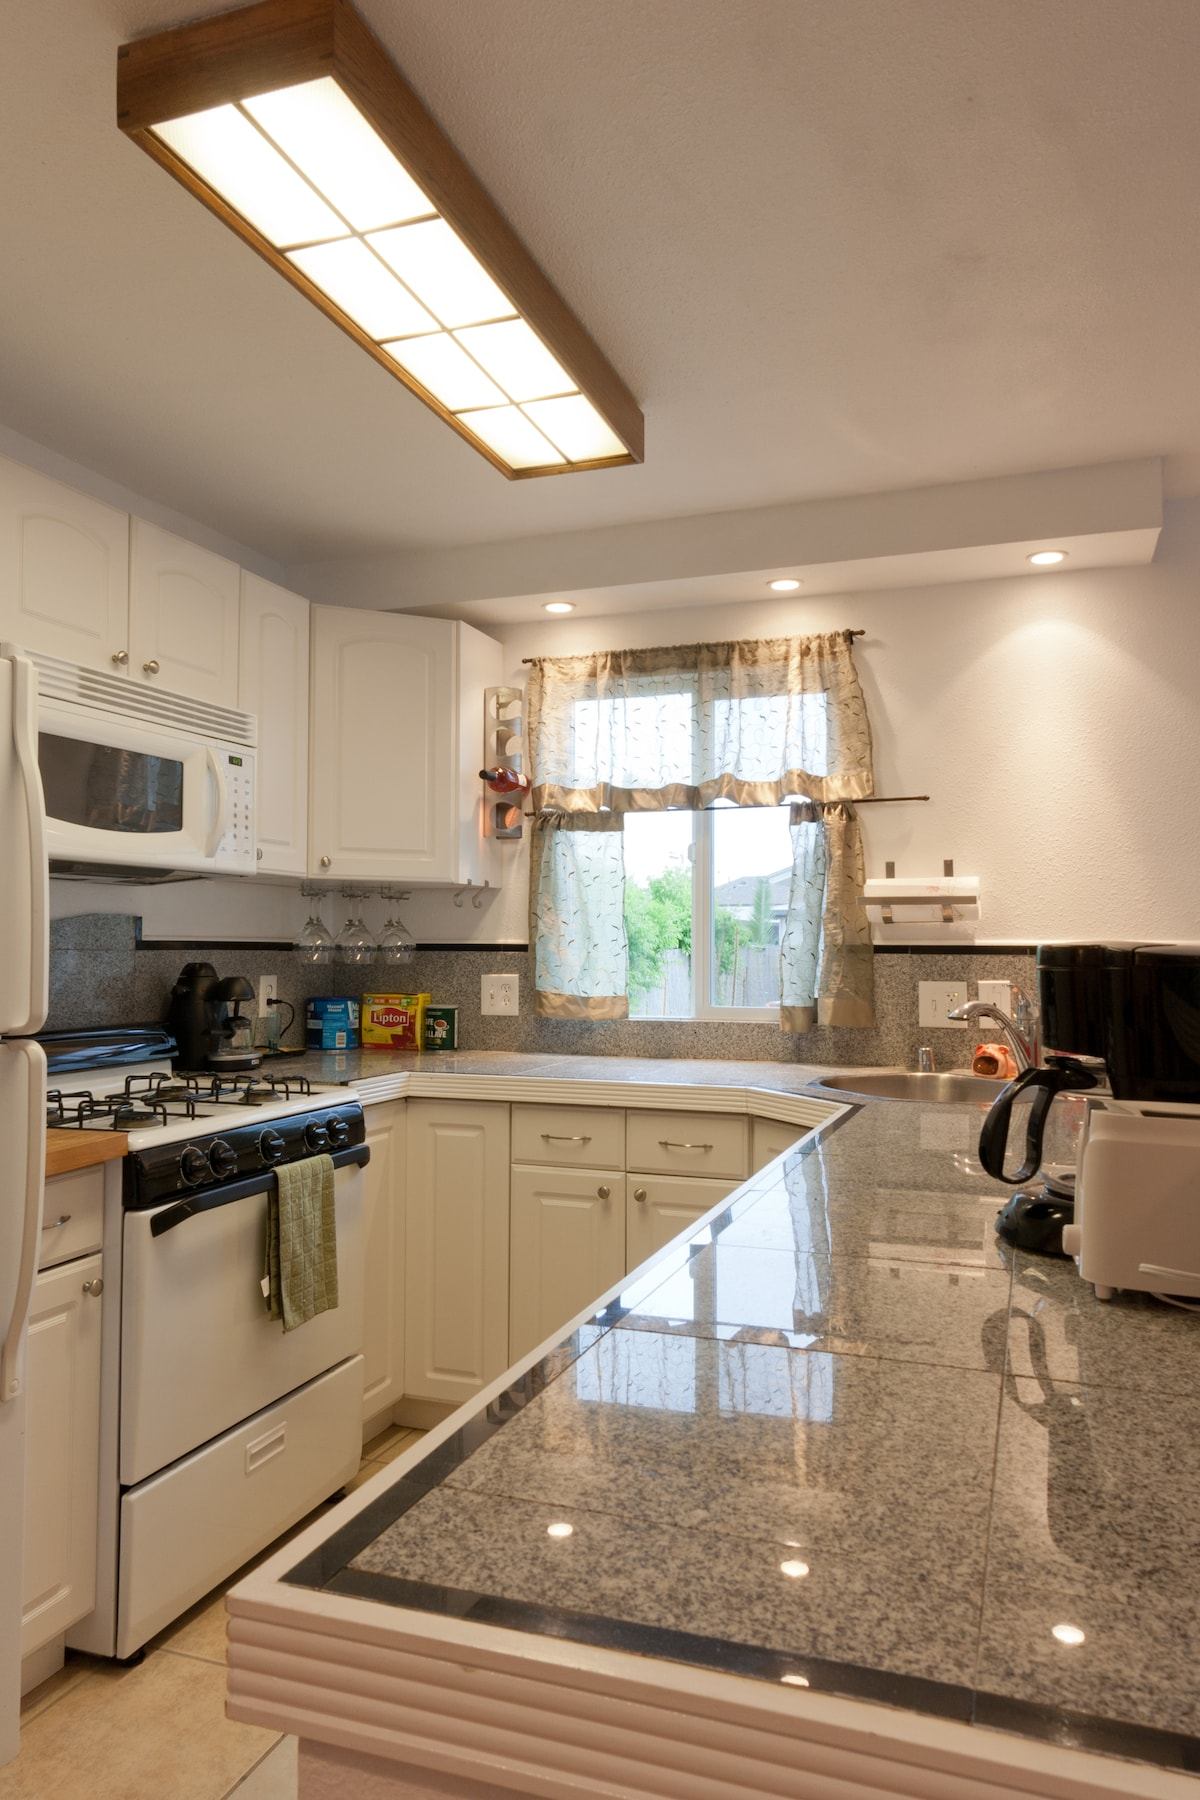 Kitchen (much wider then it looks in the skewed photo)